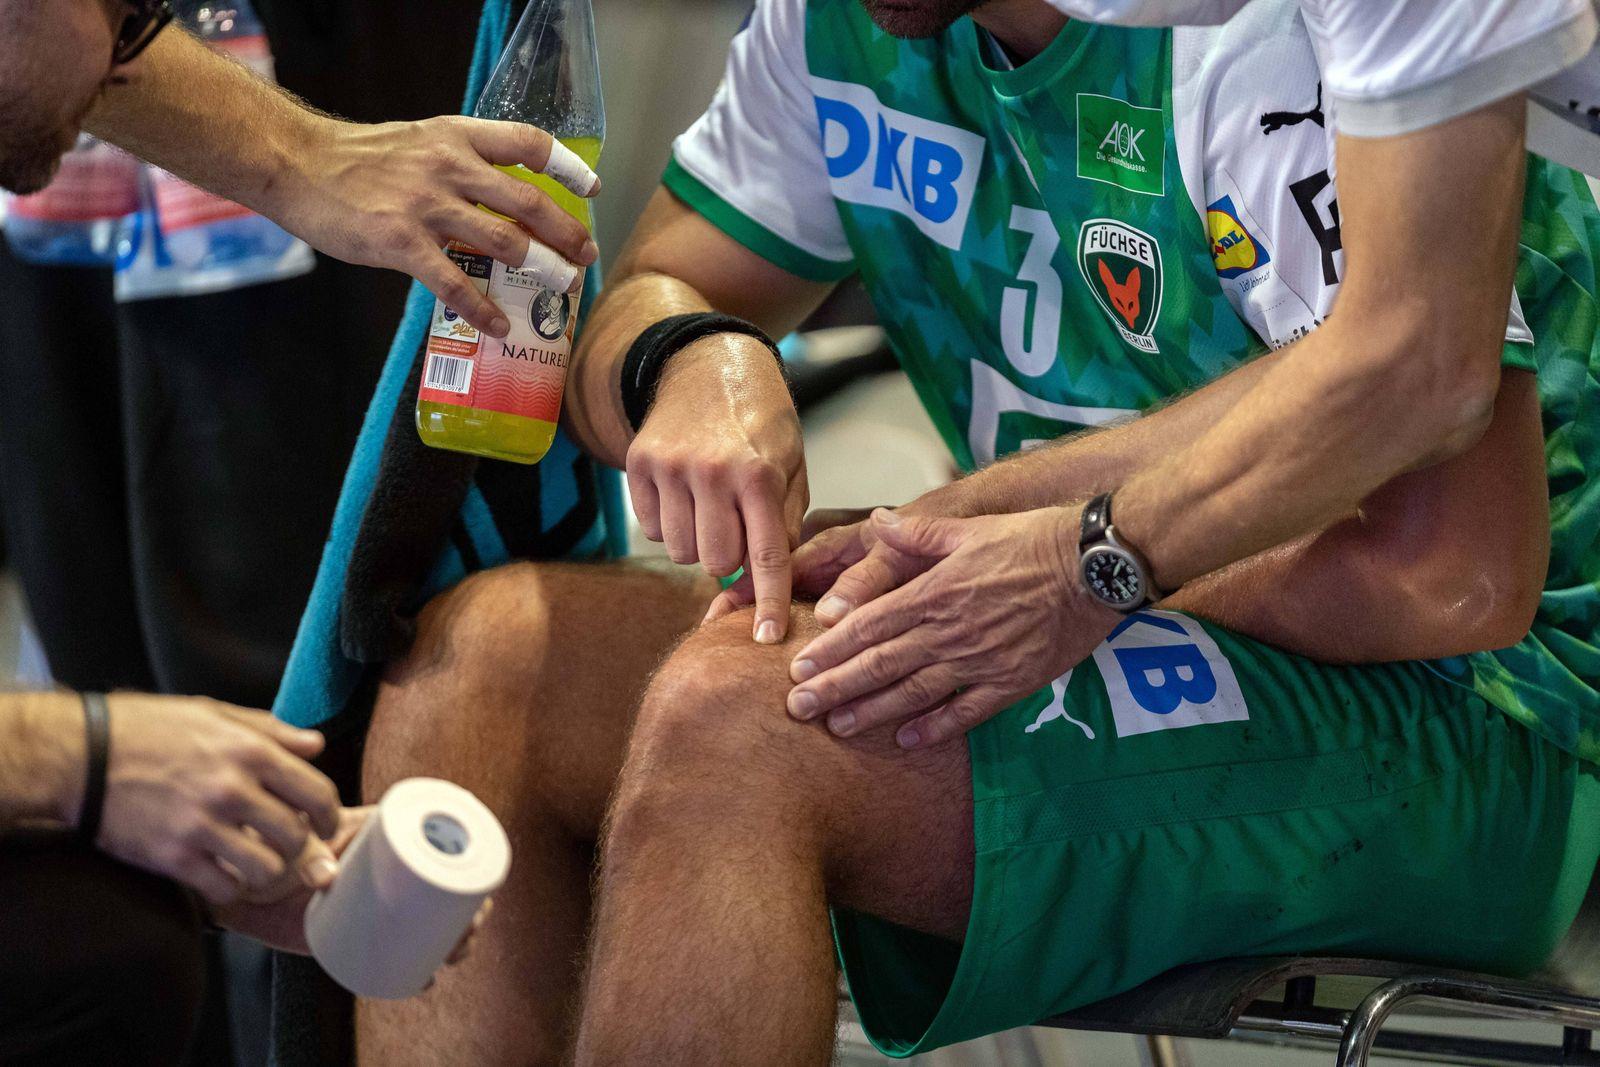 Handball Berlin 15.10.2020 Saison 2020 / 2021 1. Bundesliga / HBL Füchse Berlin - TSV Hannover-Burgdorf Verletzung am Kn